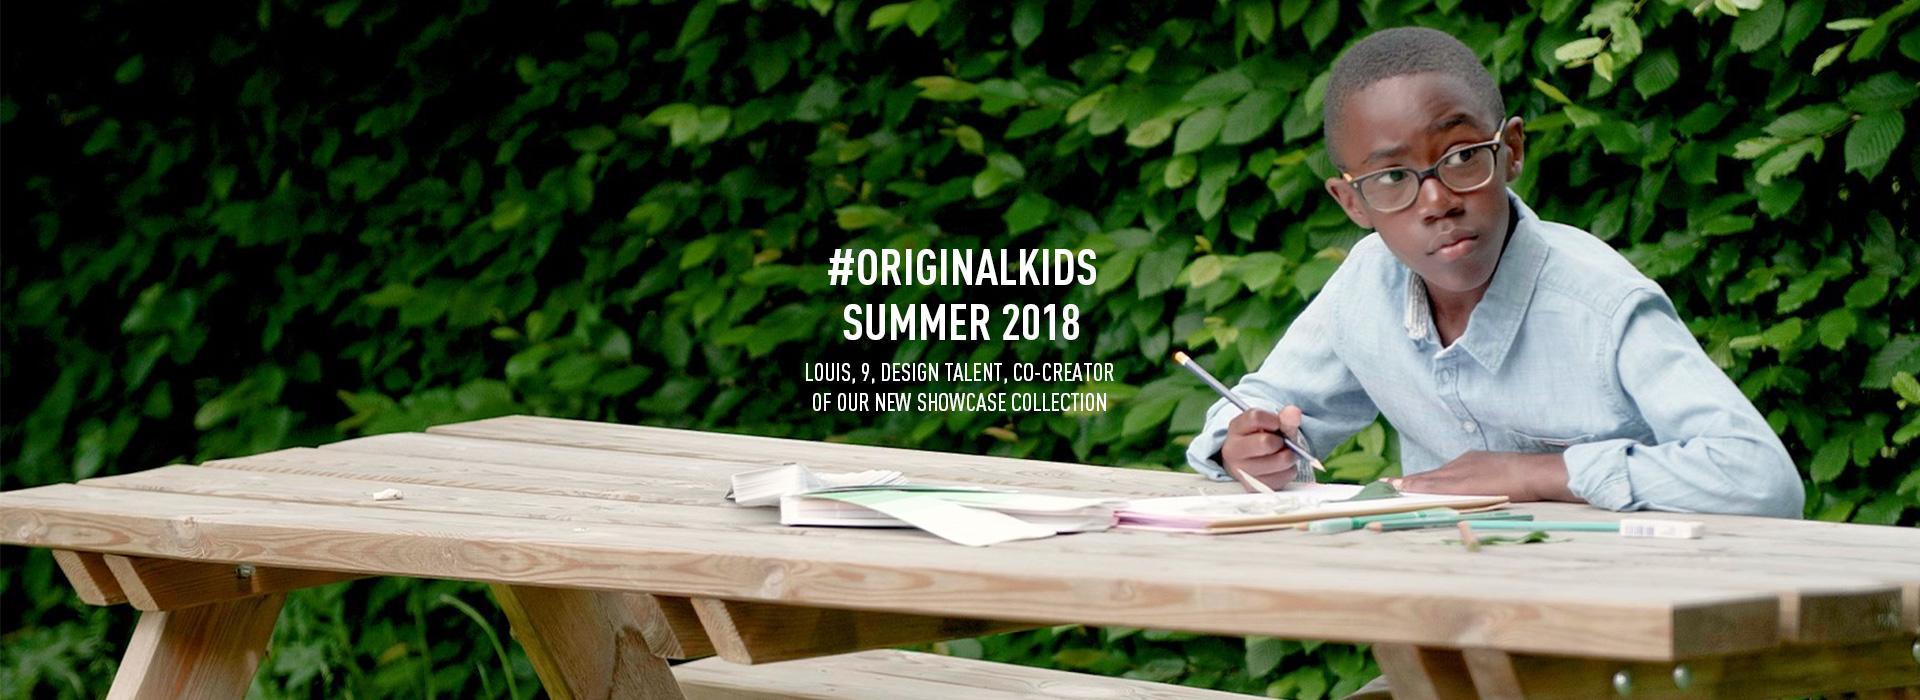 Romane Original Kids